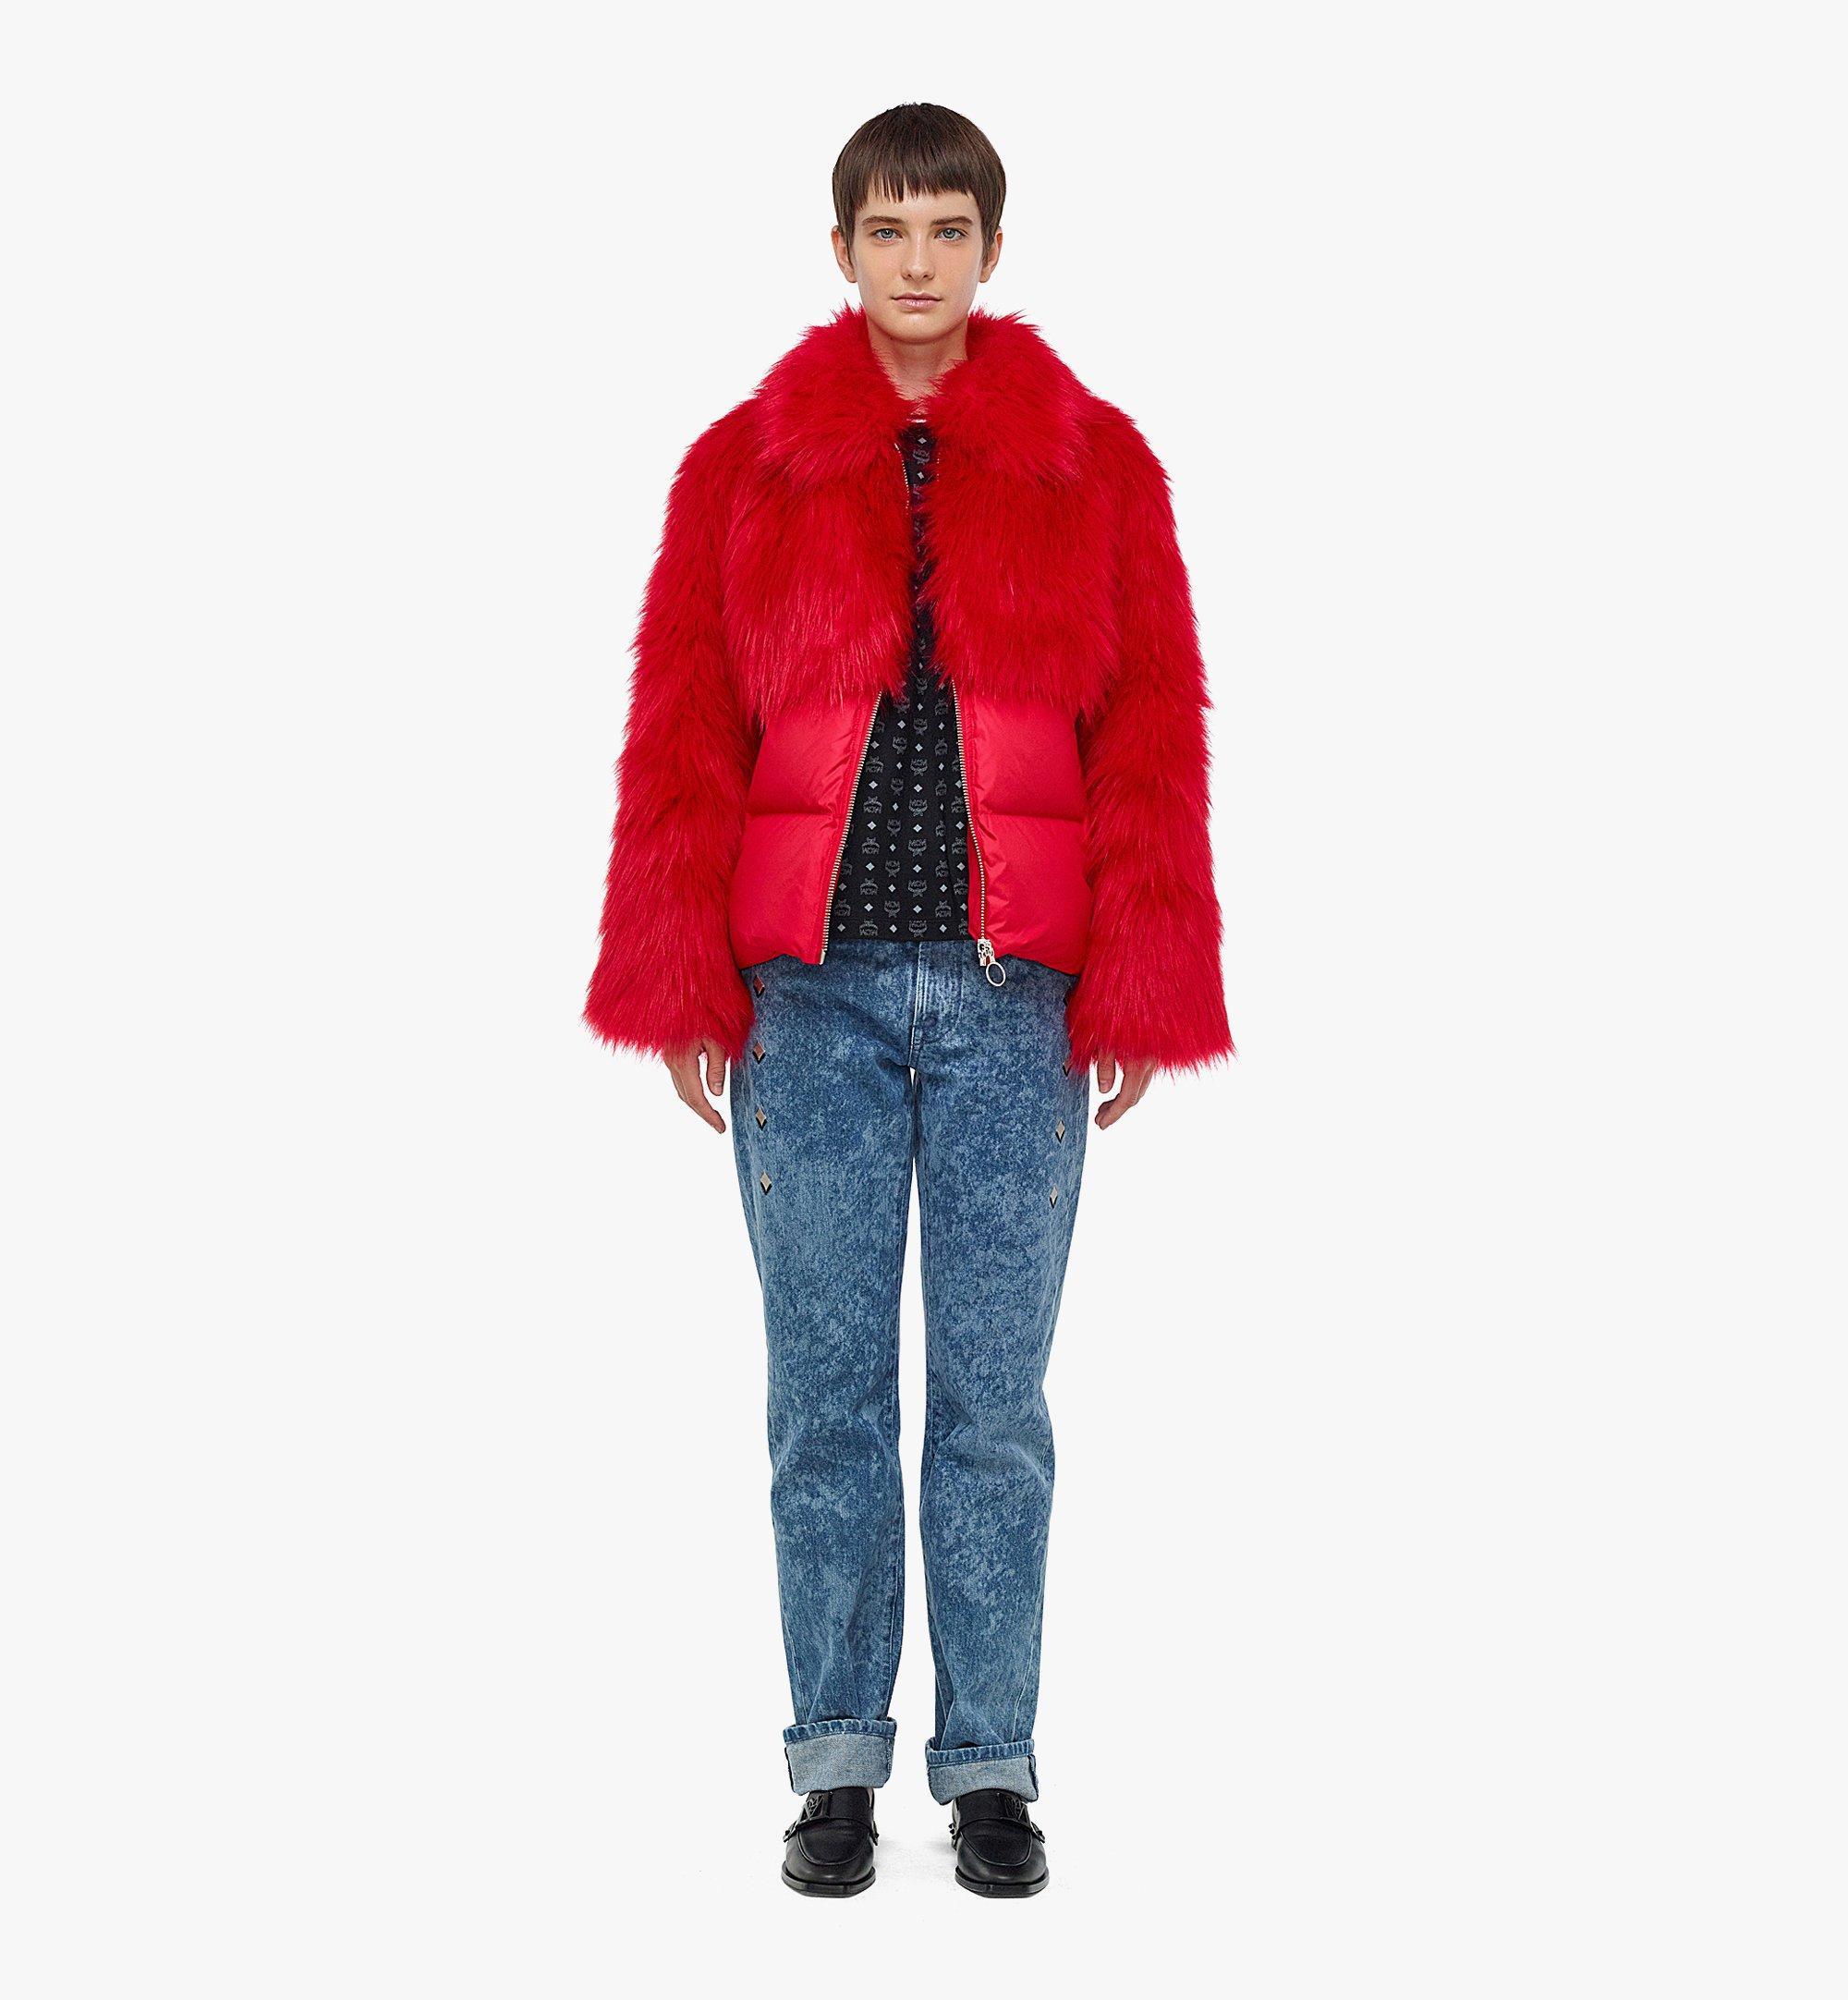 MCM Women's Faux Fur Puffer Jacket Red MFCBAMM02R0040 Alternate View 3